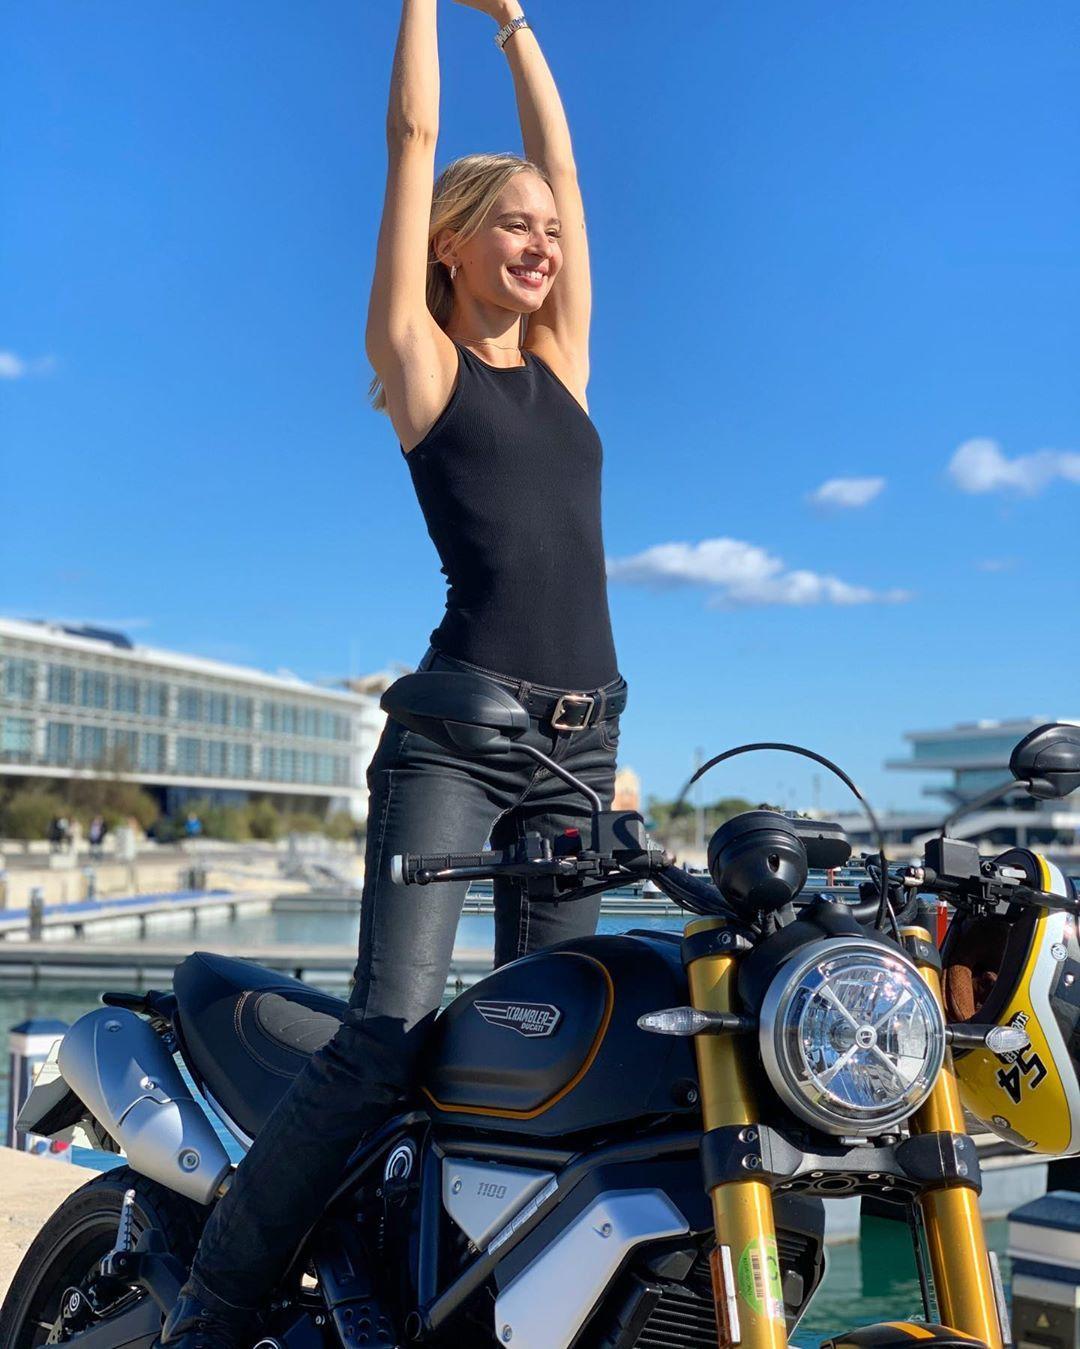 "Dominika Grnova on Instagram: ""Wakey Wakey sunshine!!! Time to ride to @circuitvalencia to watch qualifying of the last @motogp race!!!! 🤩🏁 #staytuned #DominikaRides…"""